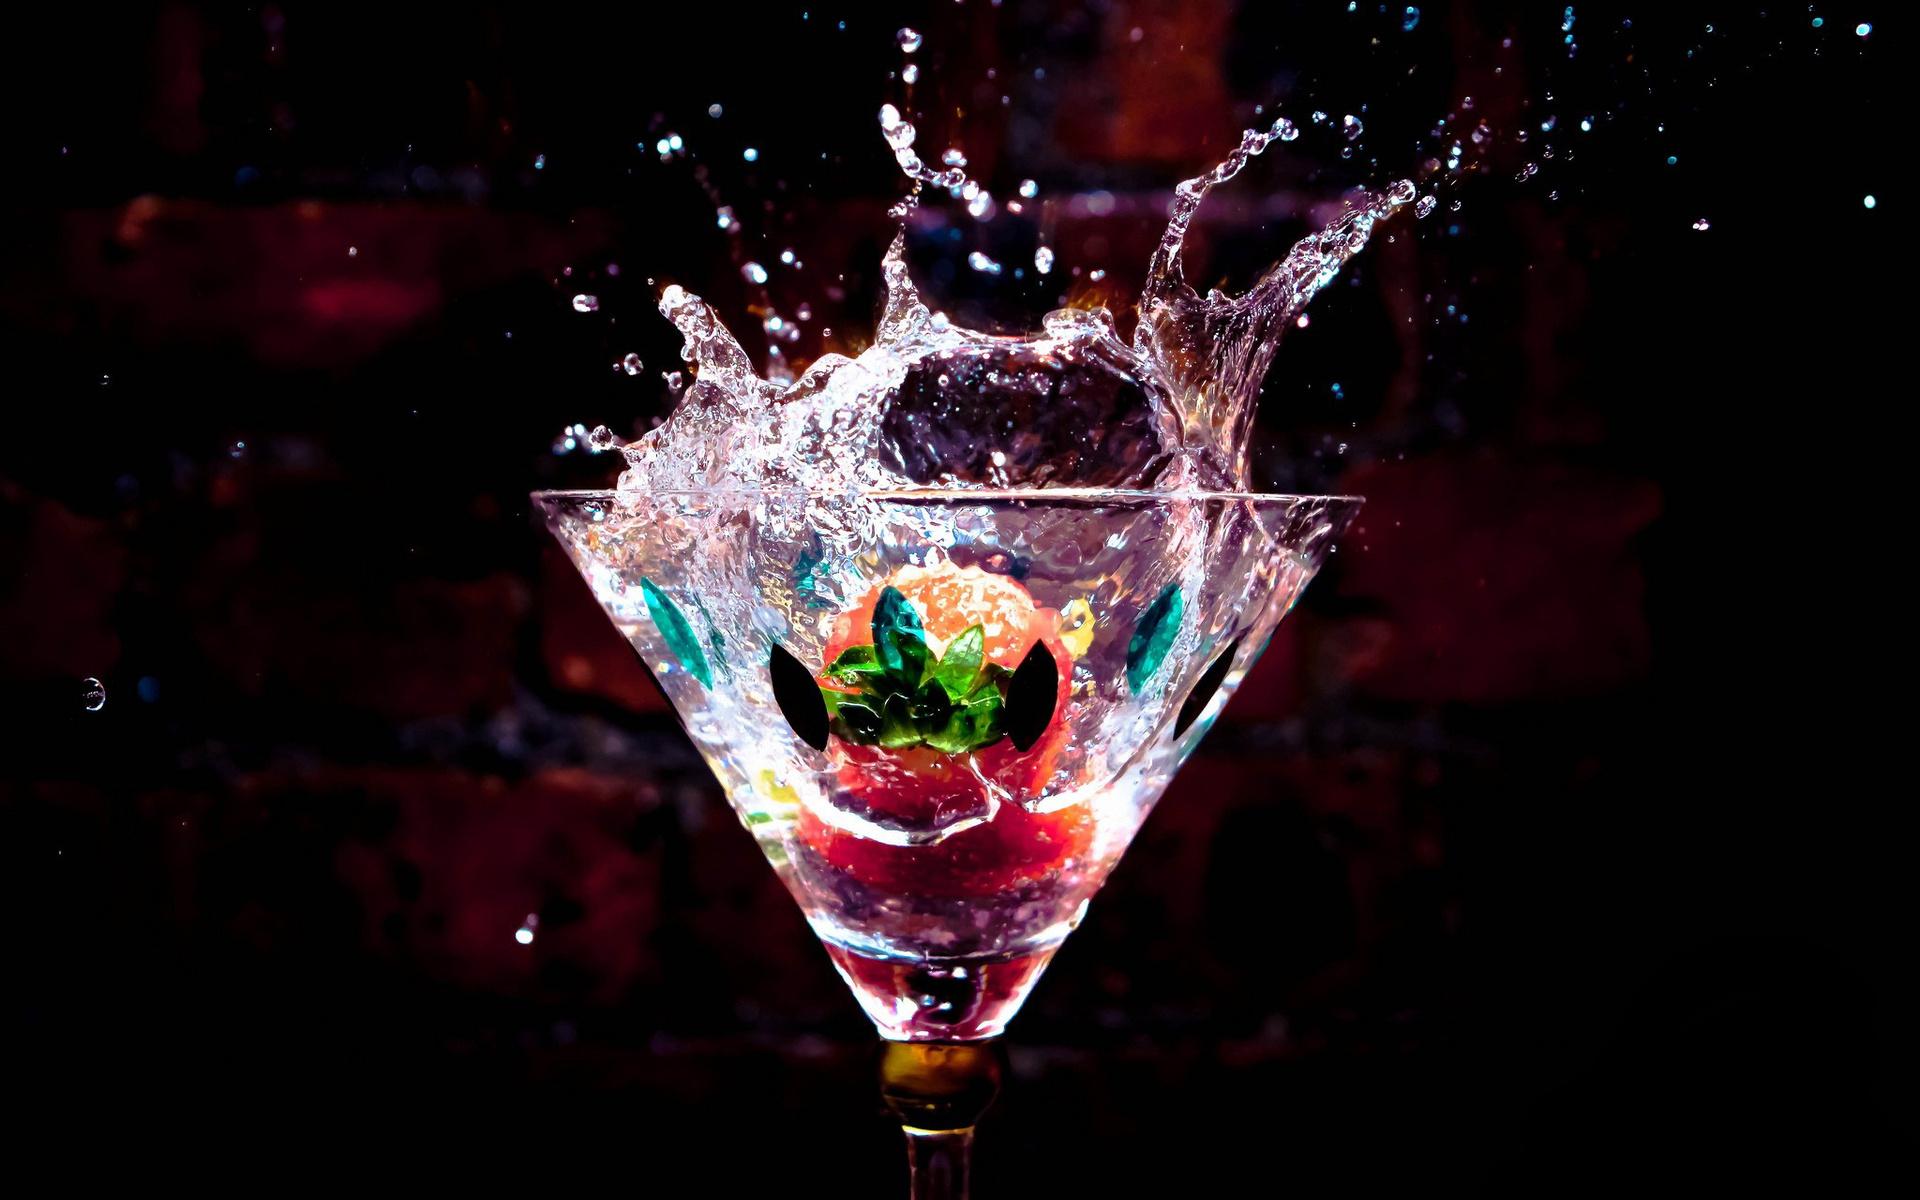 Drink Splash Wallpaper 45097